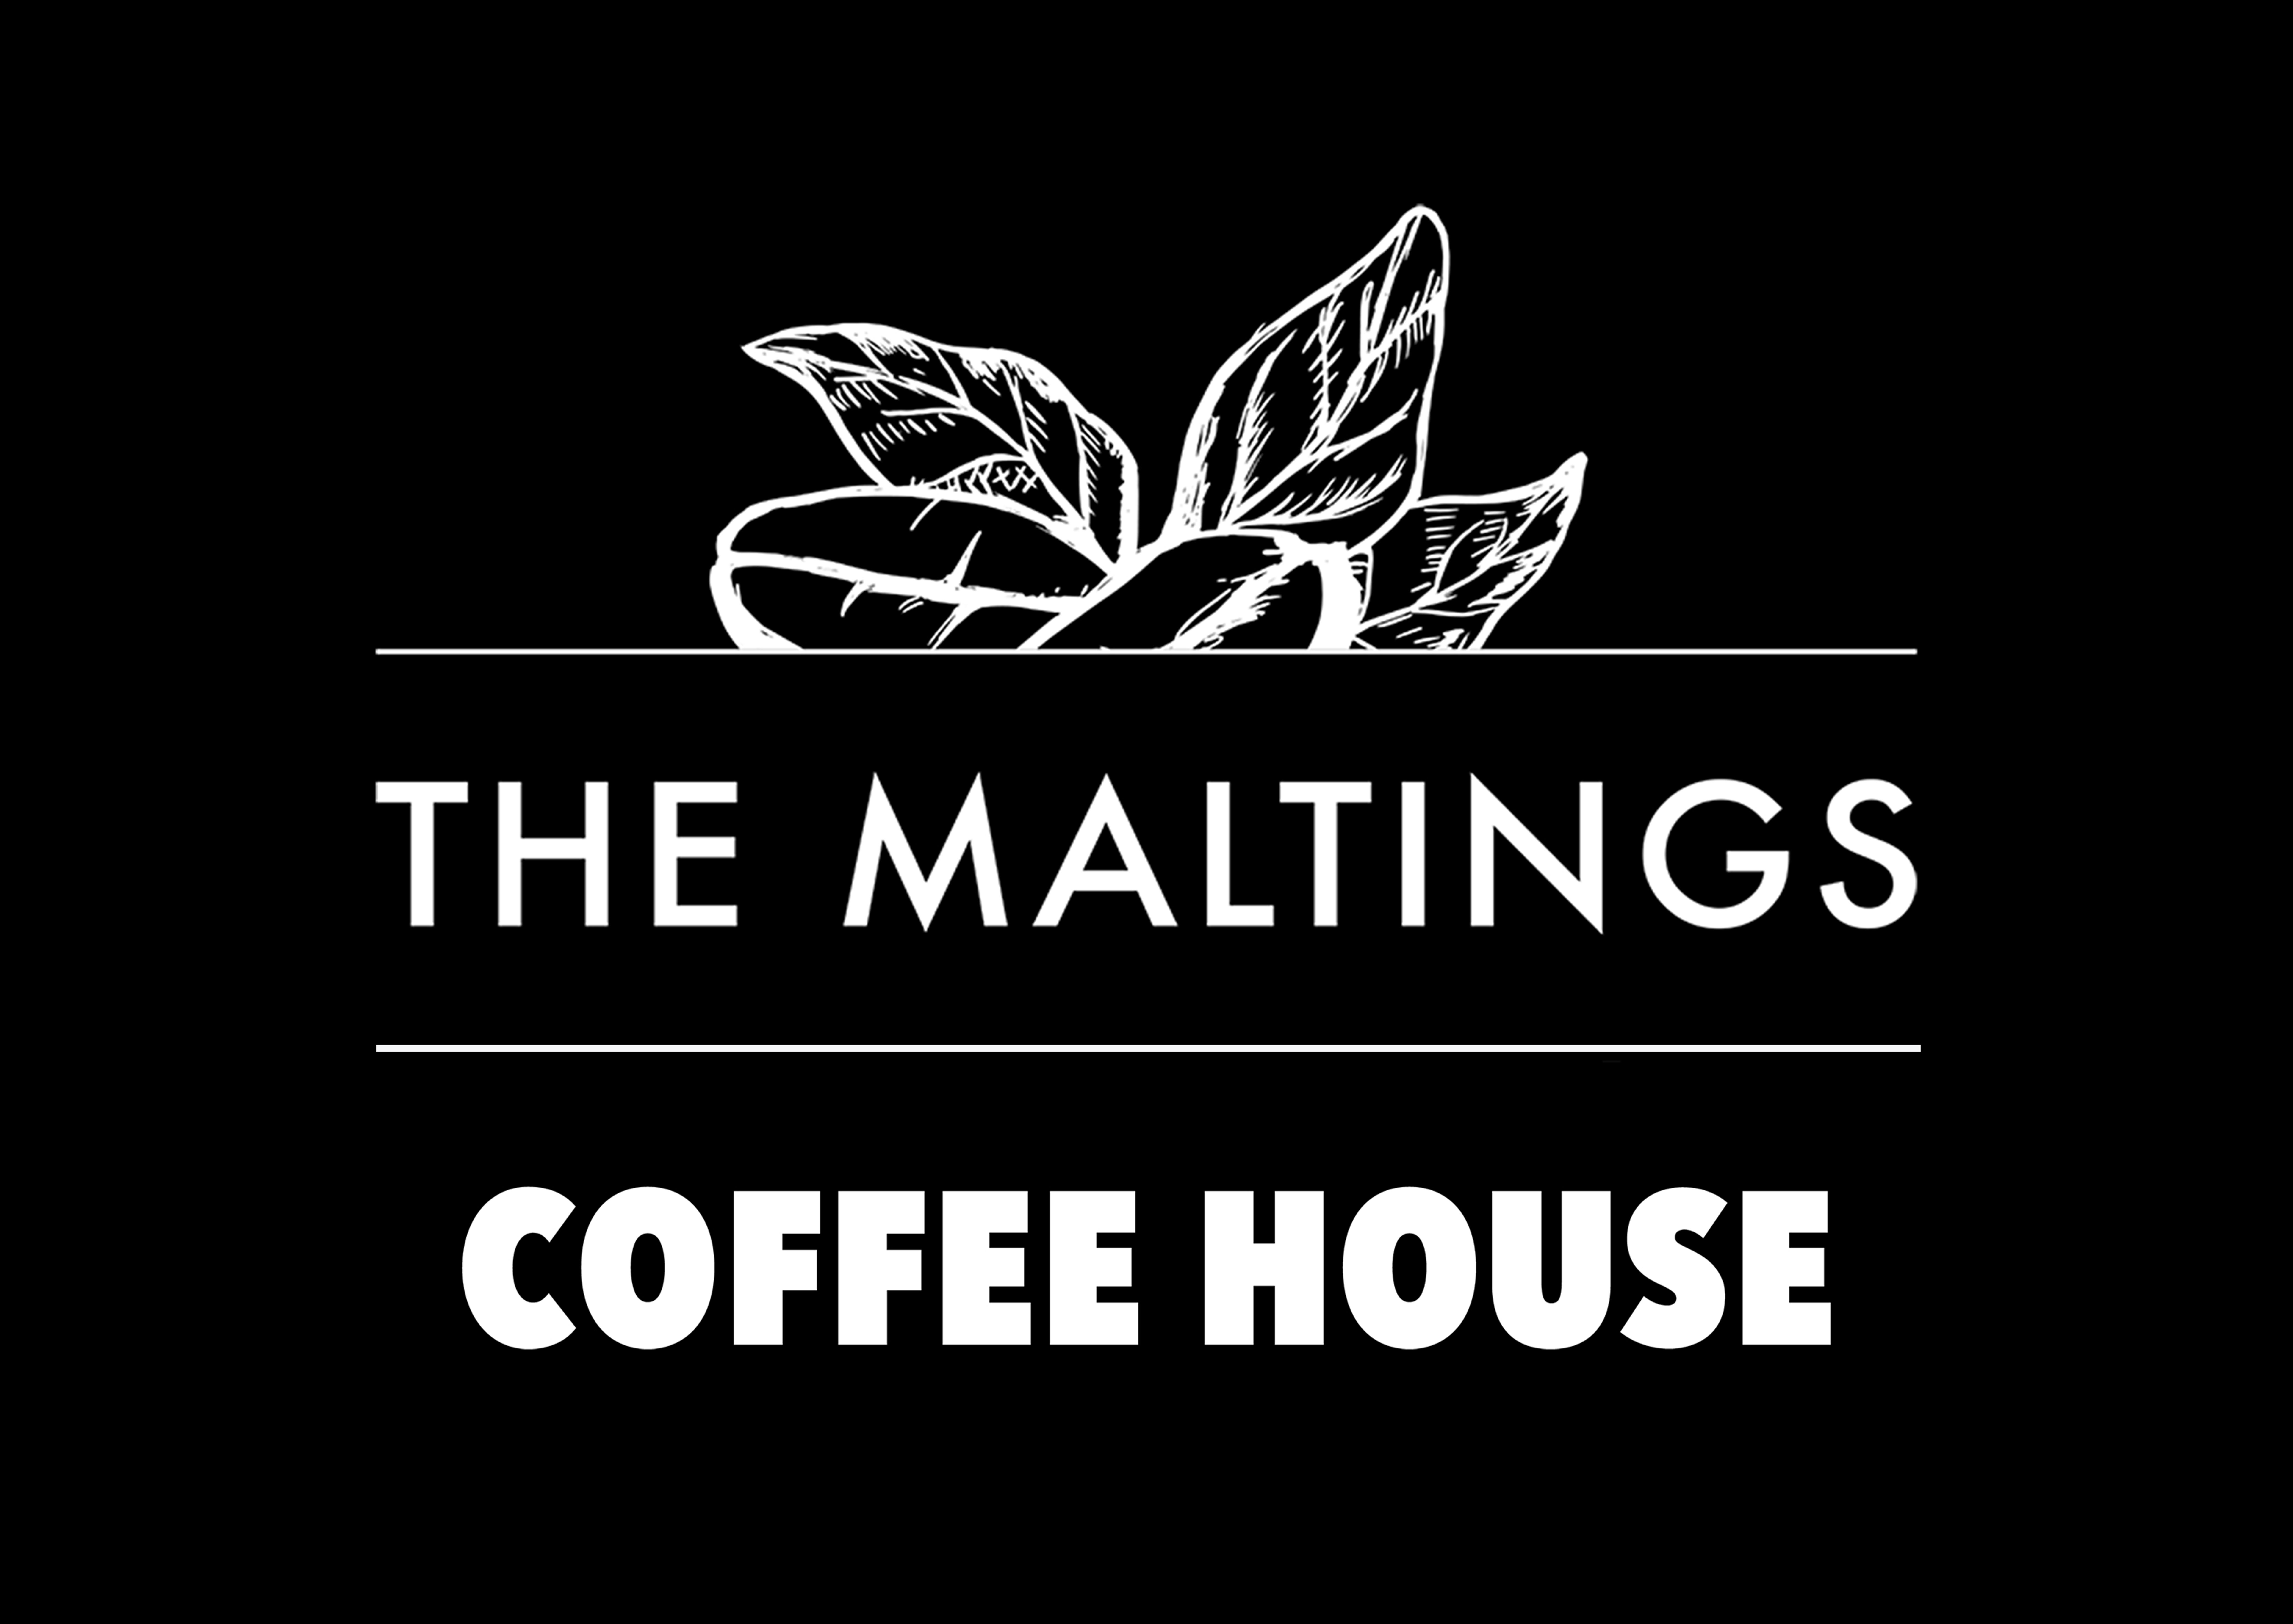 The Maltings Coffee House